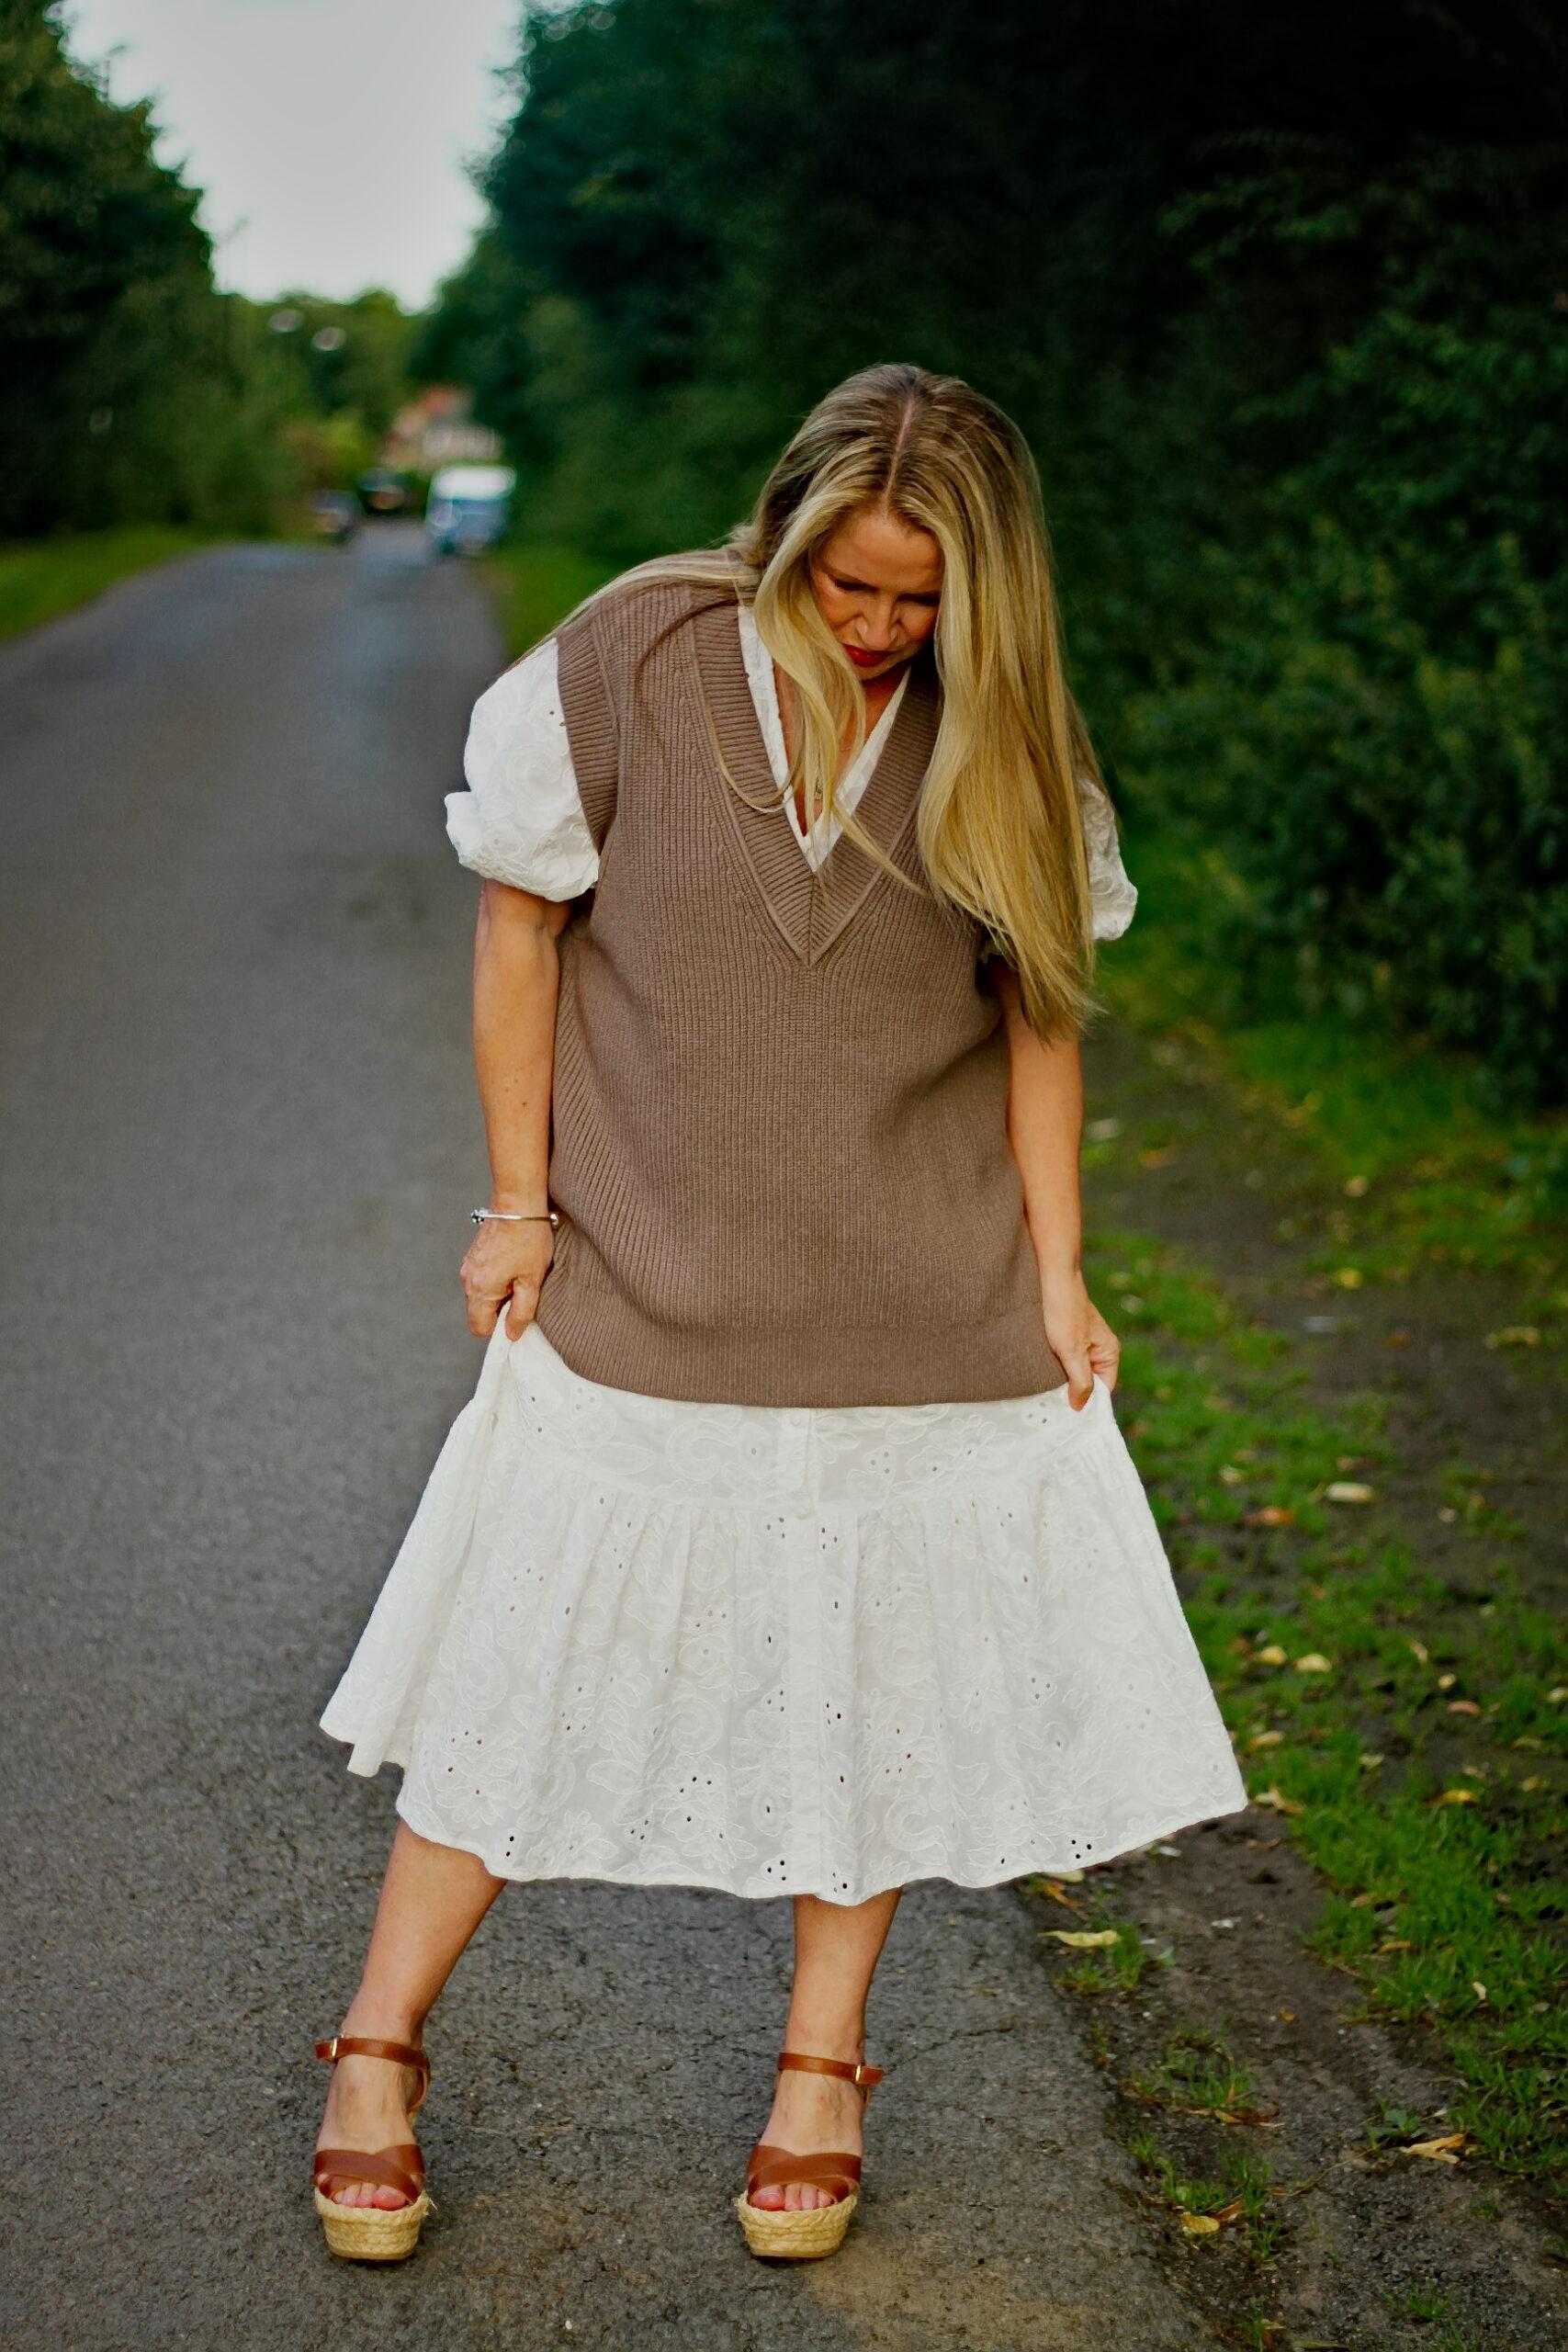 Wearing my woollen tunic with a summer dress